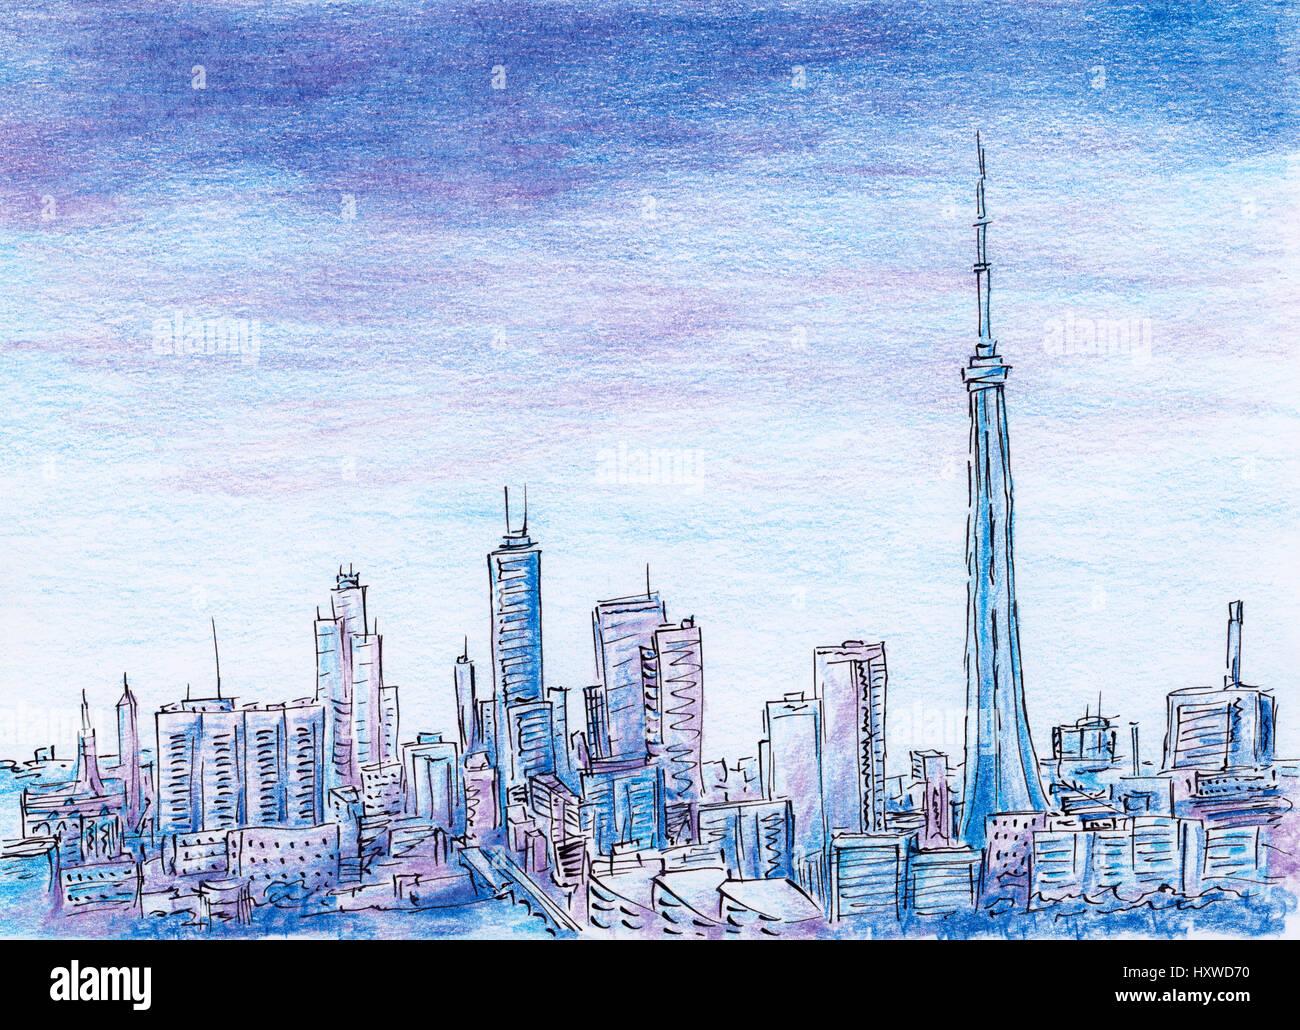 City Skyline Skyscraper Sketch Stock Photos Amp City Skyline